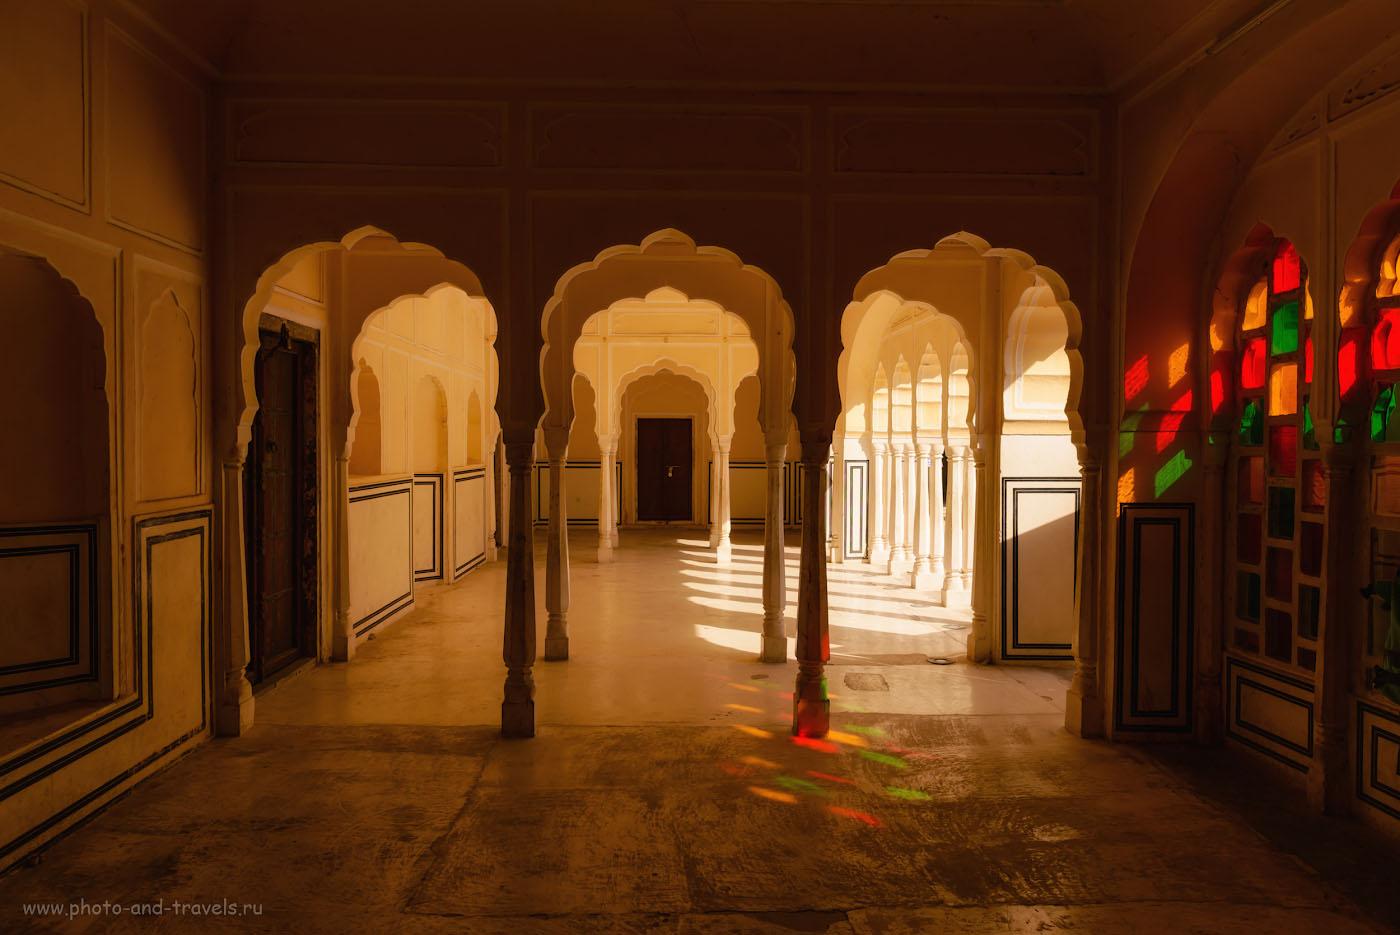 Снимок 10. Интерьеры дворца Хава-Махал. Отзывы туристов об экскурсиях по Джайпуру.1/320, -0.67, 7.1, 100, 24.